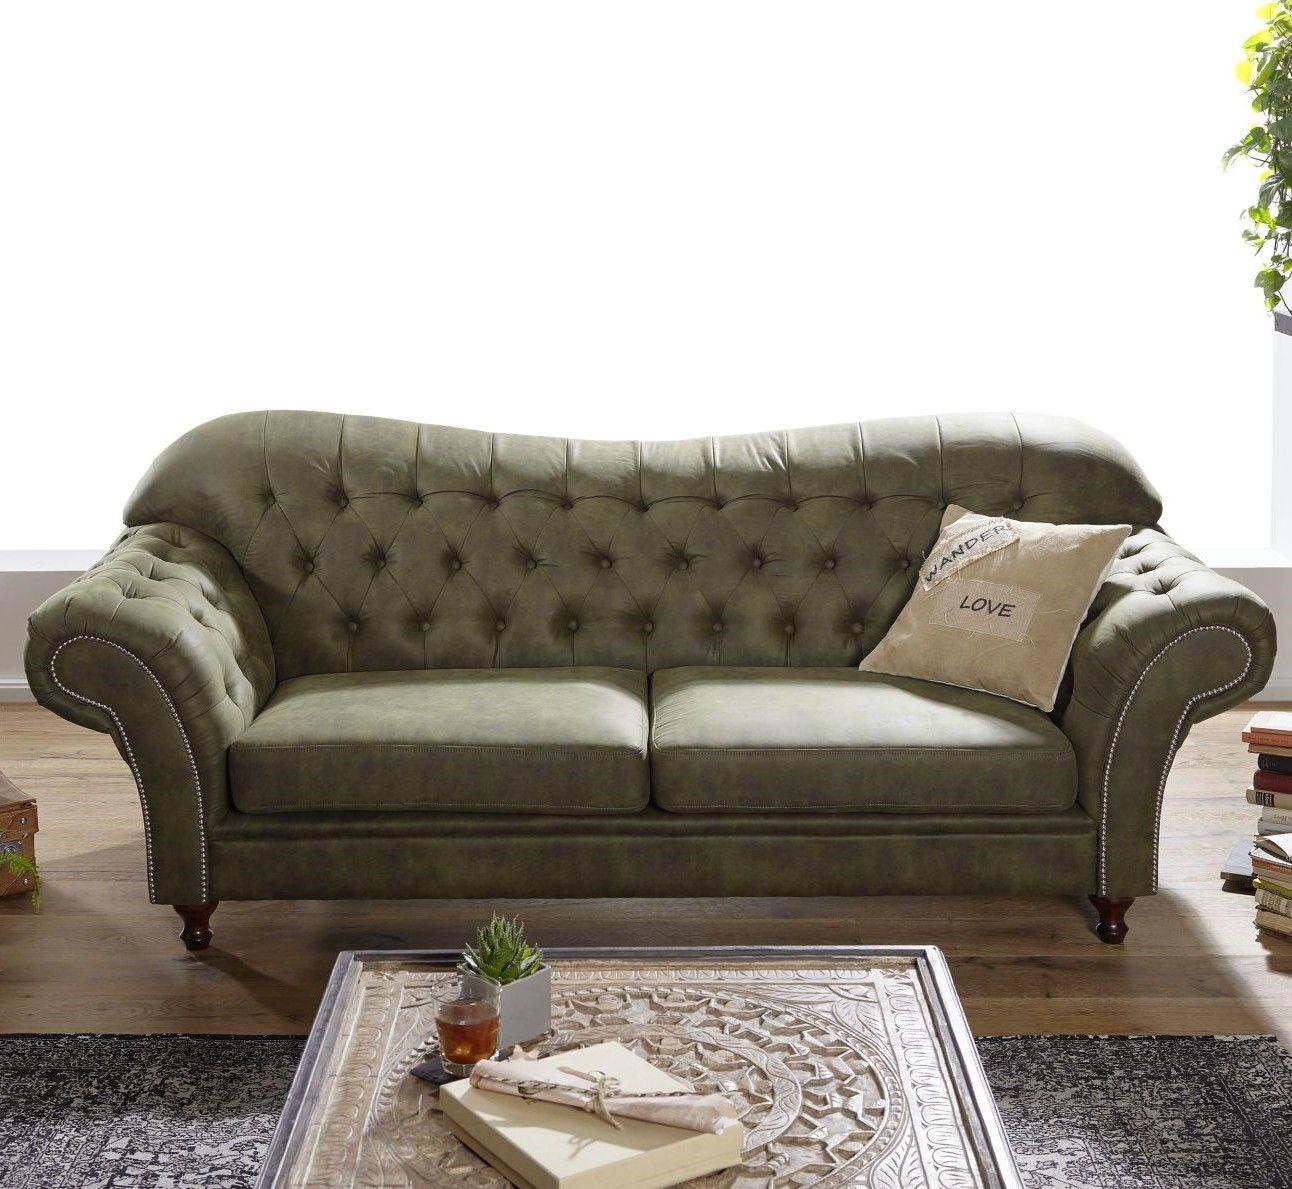 Sofa 230x90x84 Grun Sheffield Sofa Wohnzimmer Sofa Und Sofas